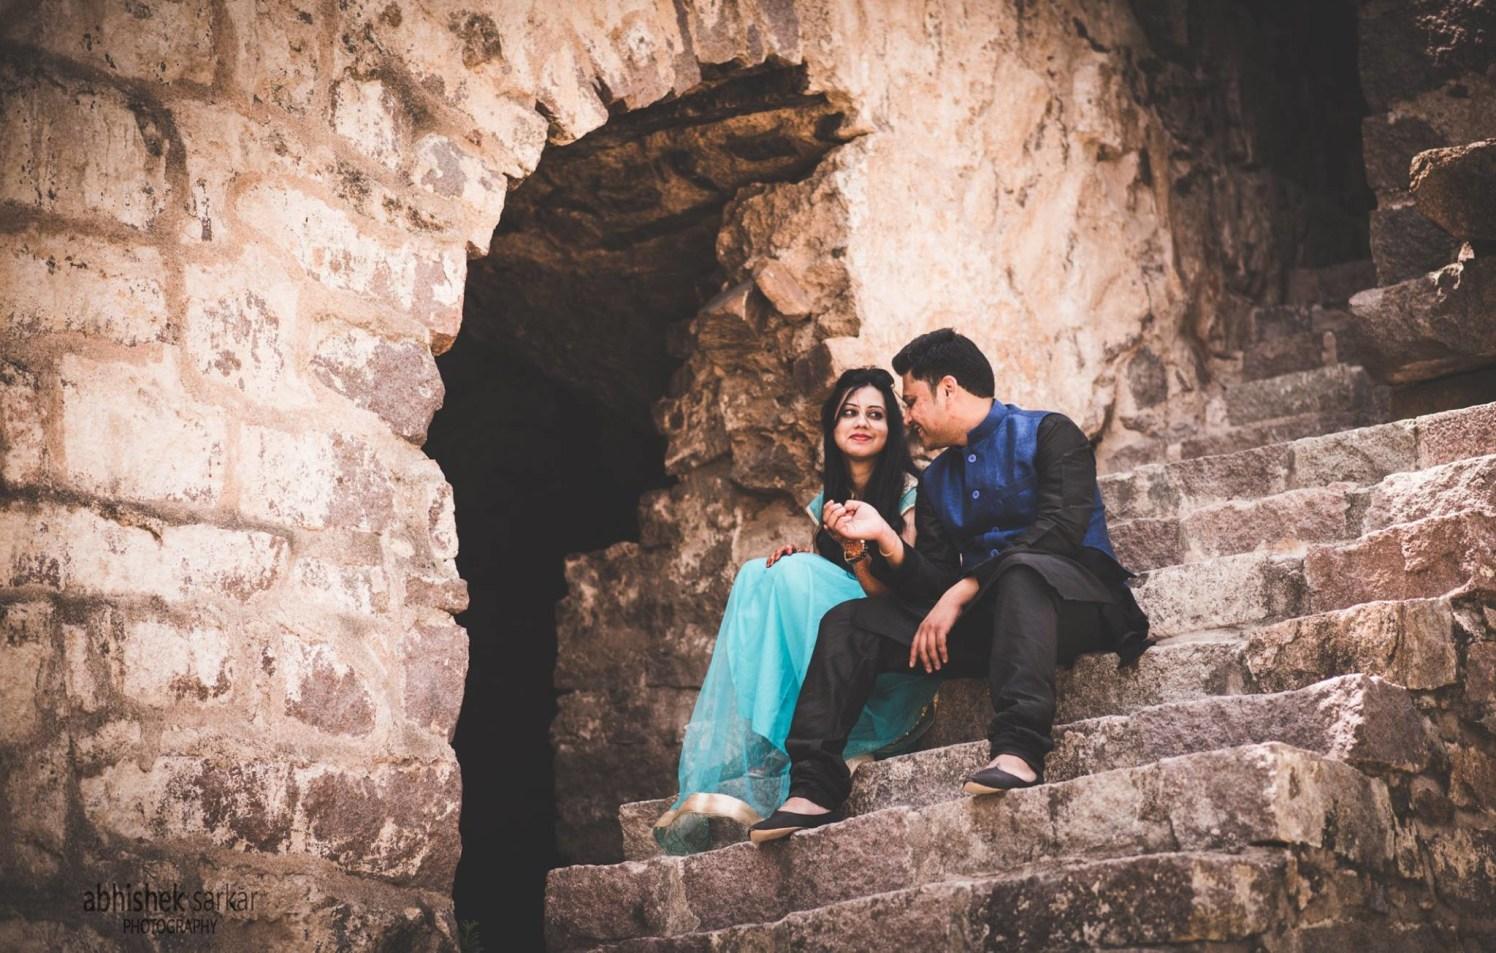 Stunning Pre Wedding Shoot by Abhishek Sarkar Wedding-photography | Weddings Photos & Ideas